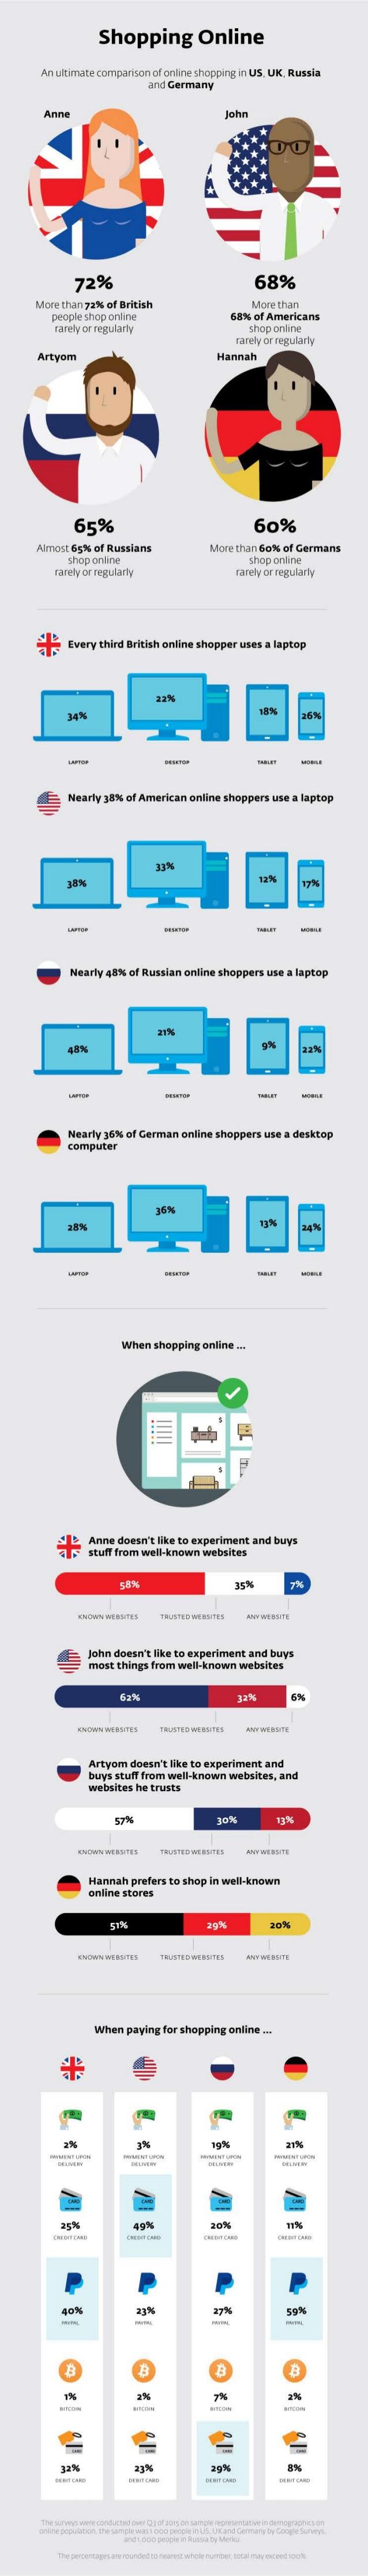 shopping-online-1-638